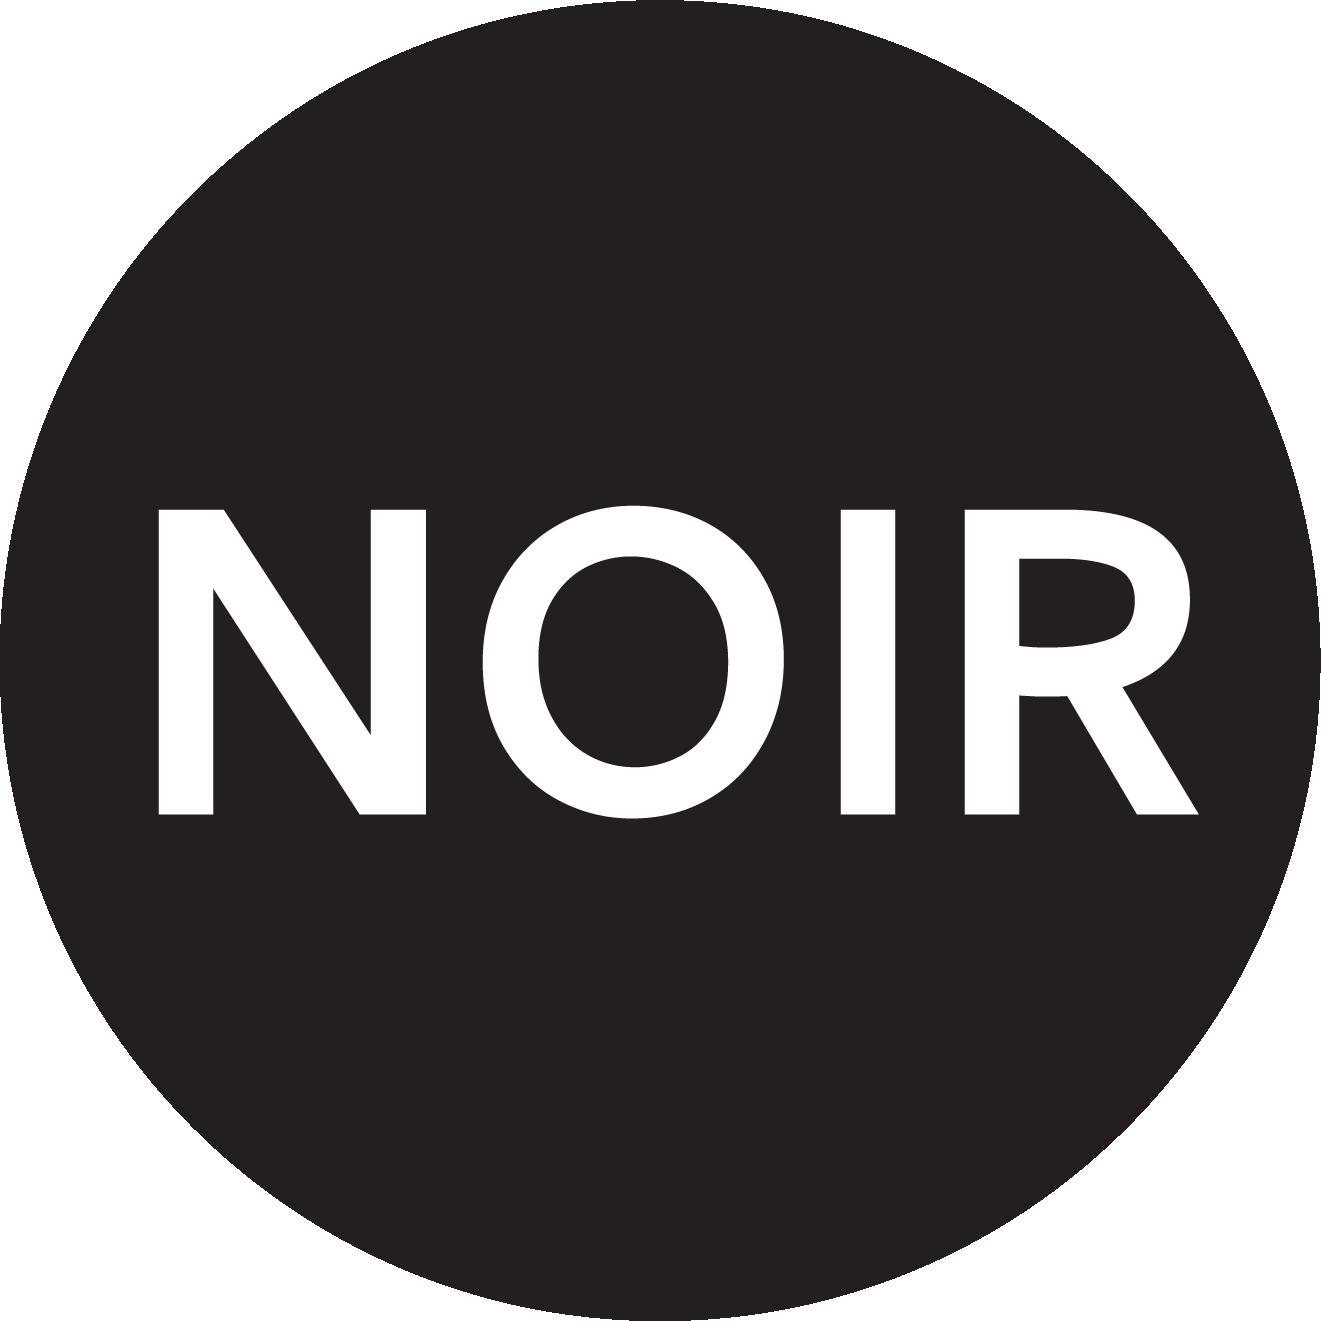 Tov Noir